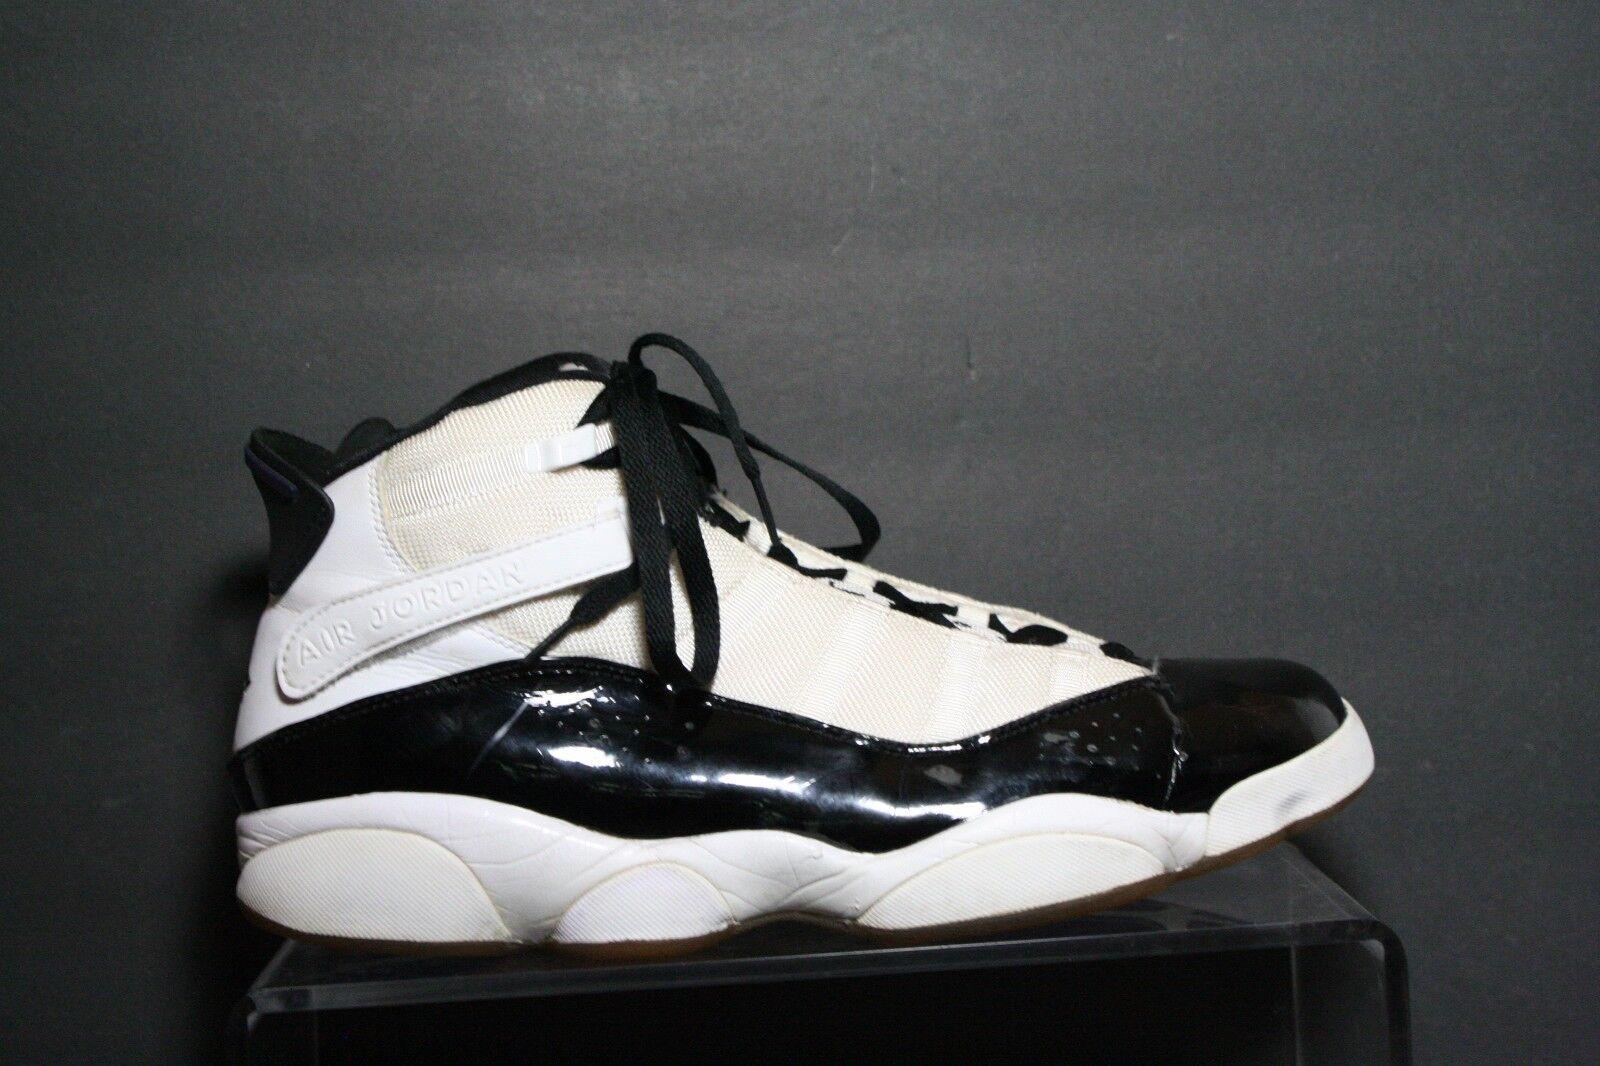 Nike air jordan 6 anelli concordia 2008 scarpe uomini 12 atletico basket bianco nero